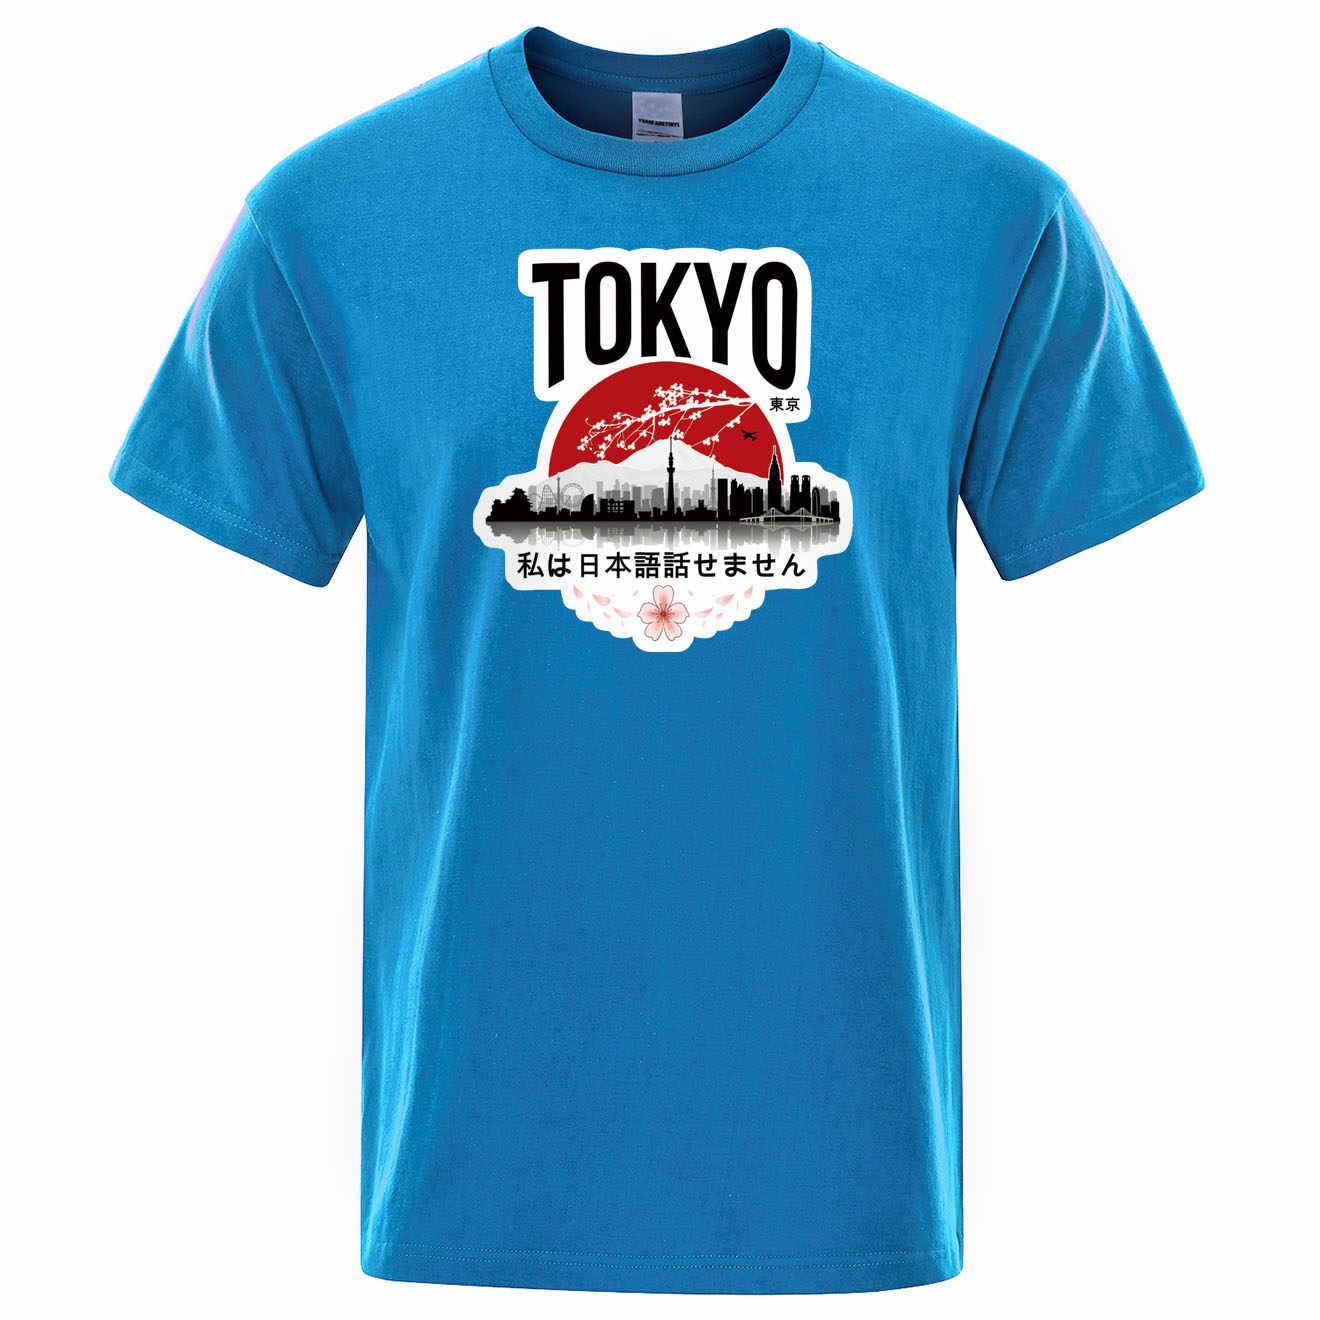 Tokyo baskı T-shirt ben değil hoparlör japon tasarım erkek T-shirt erkek giysileri 2020 yaz T Shirt erkek pamuk siyah Tees Tops